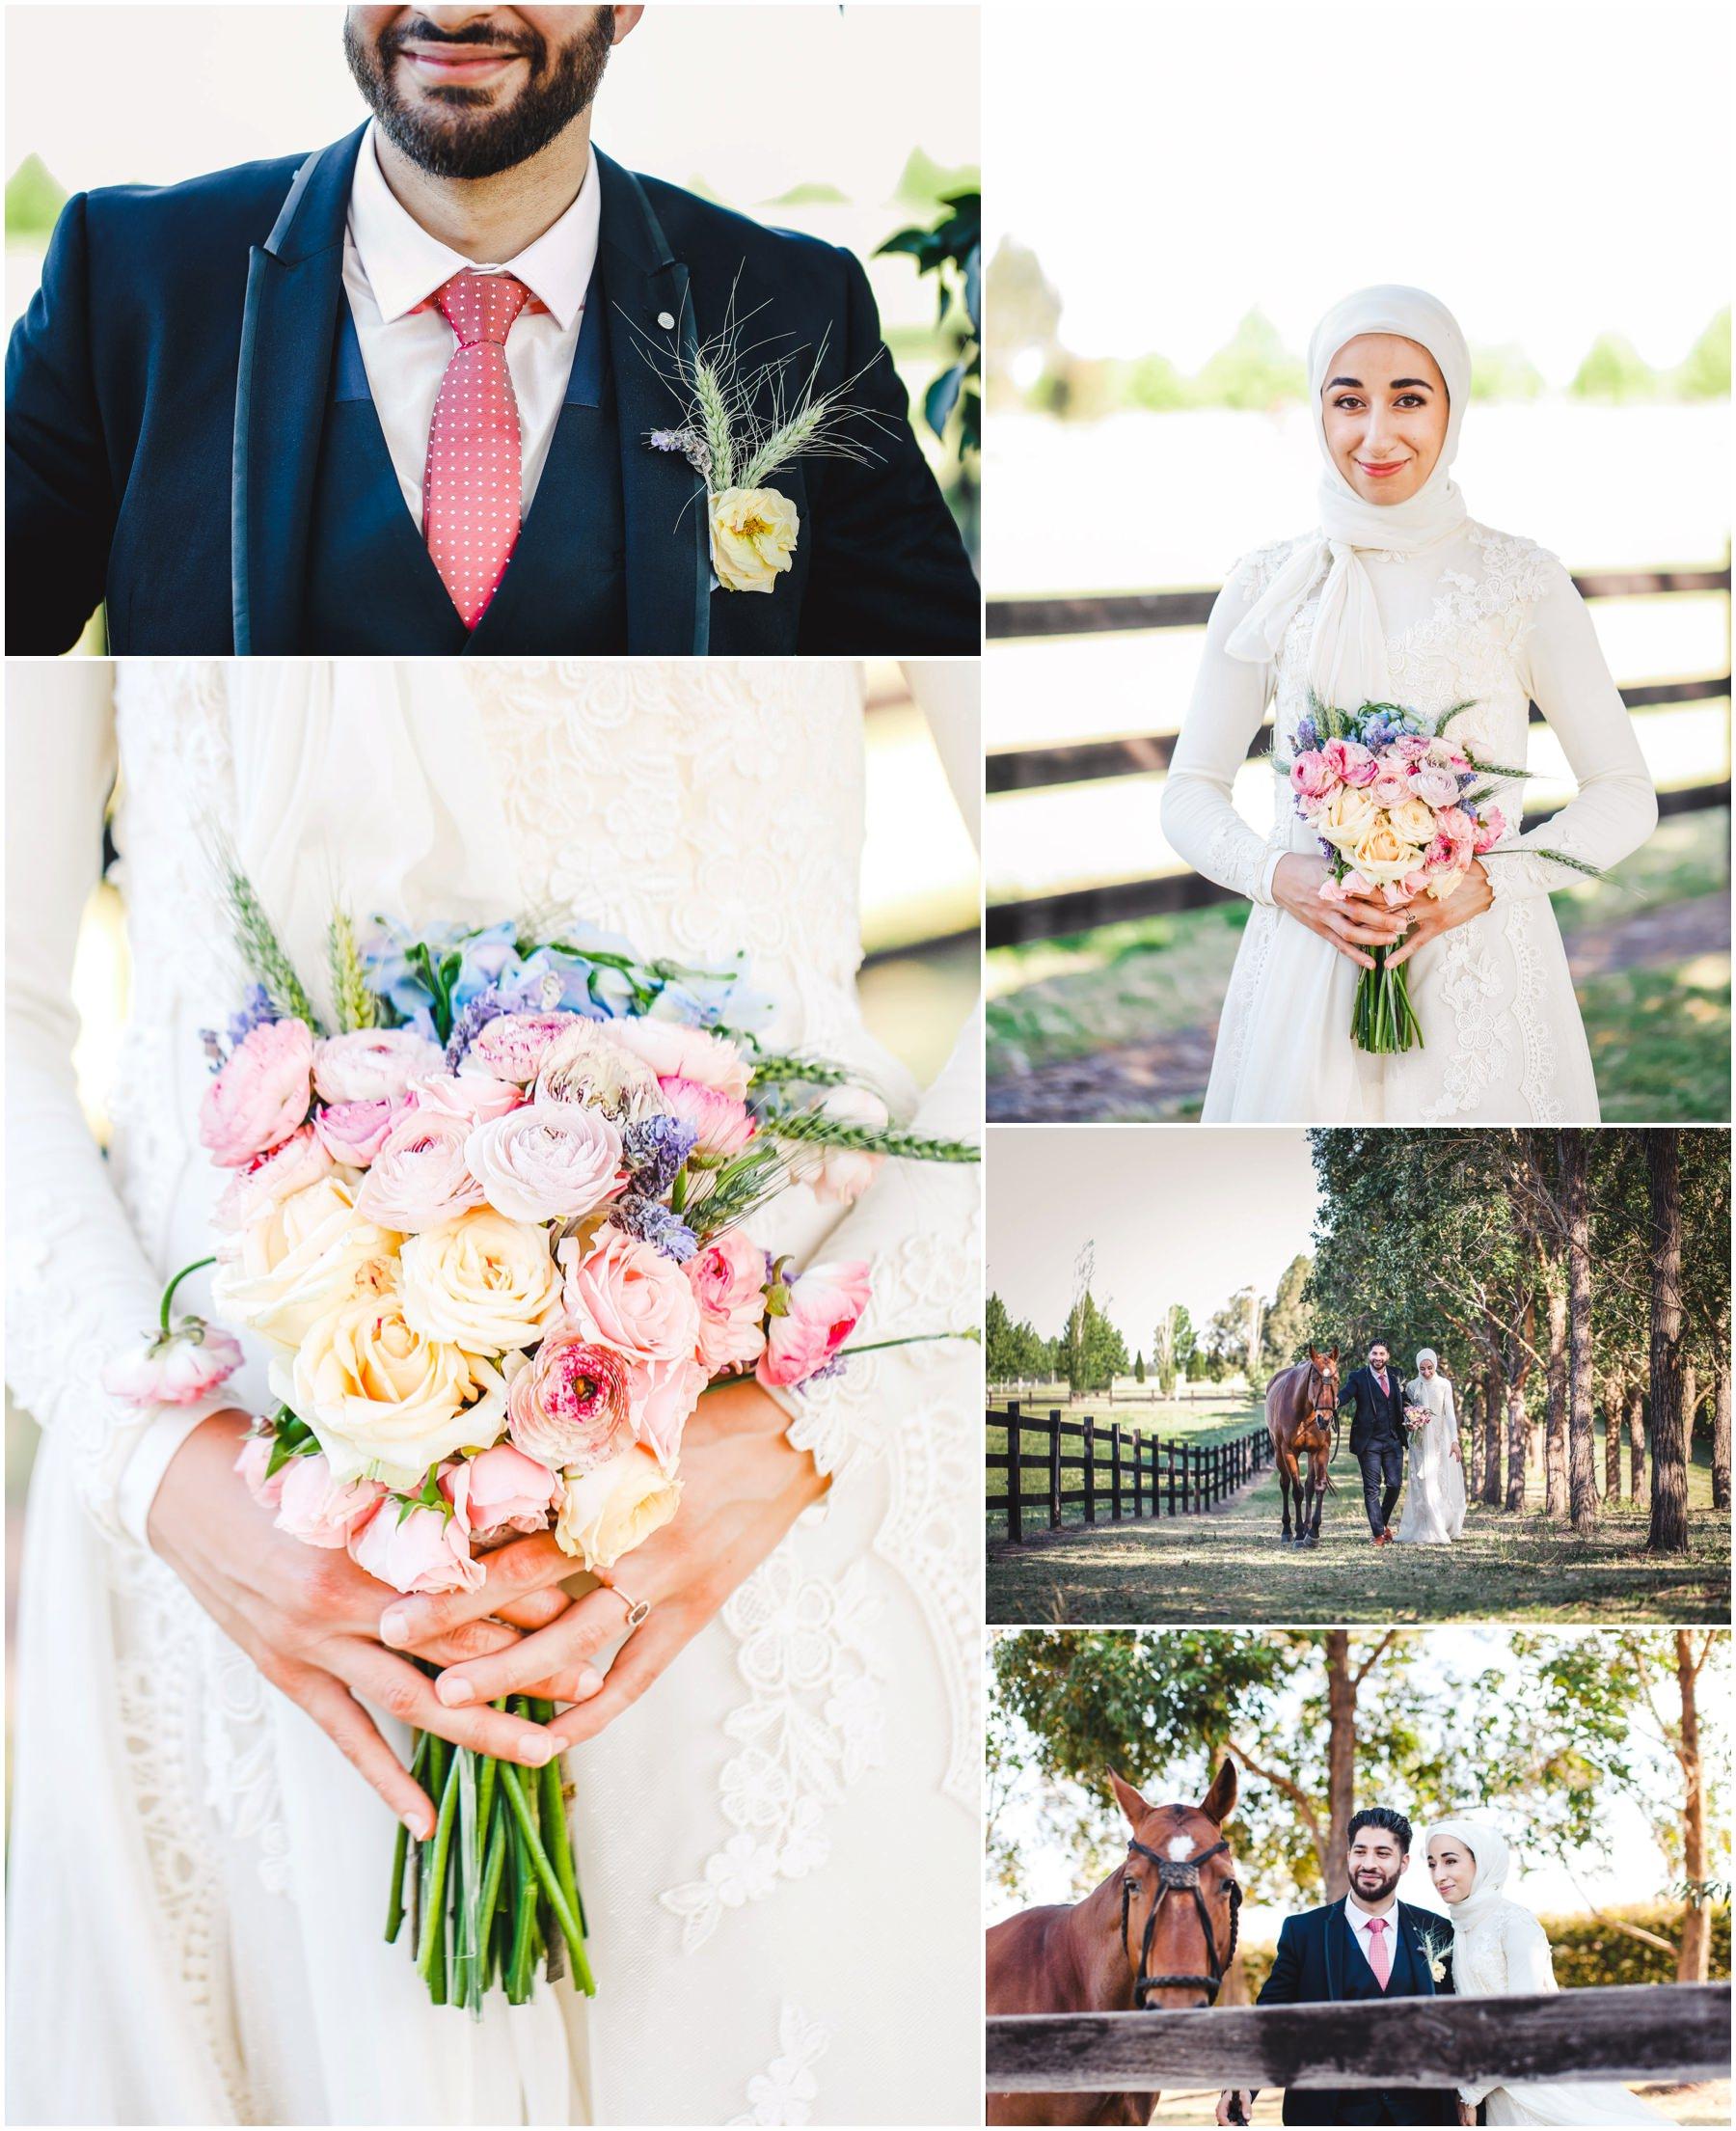 Suzanne + Neema's traditional Muslim wedding at the Sydney